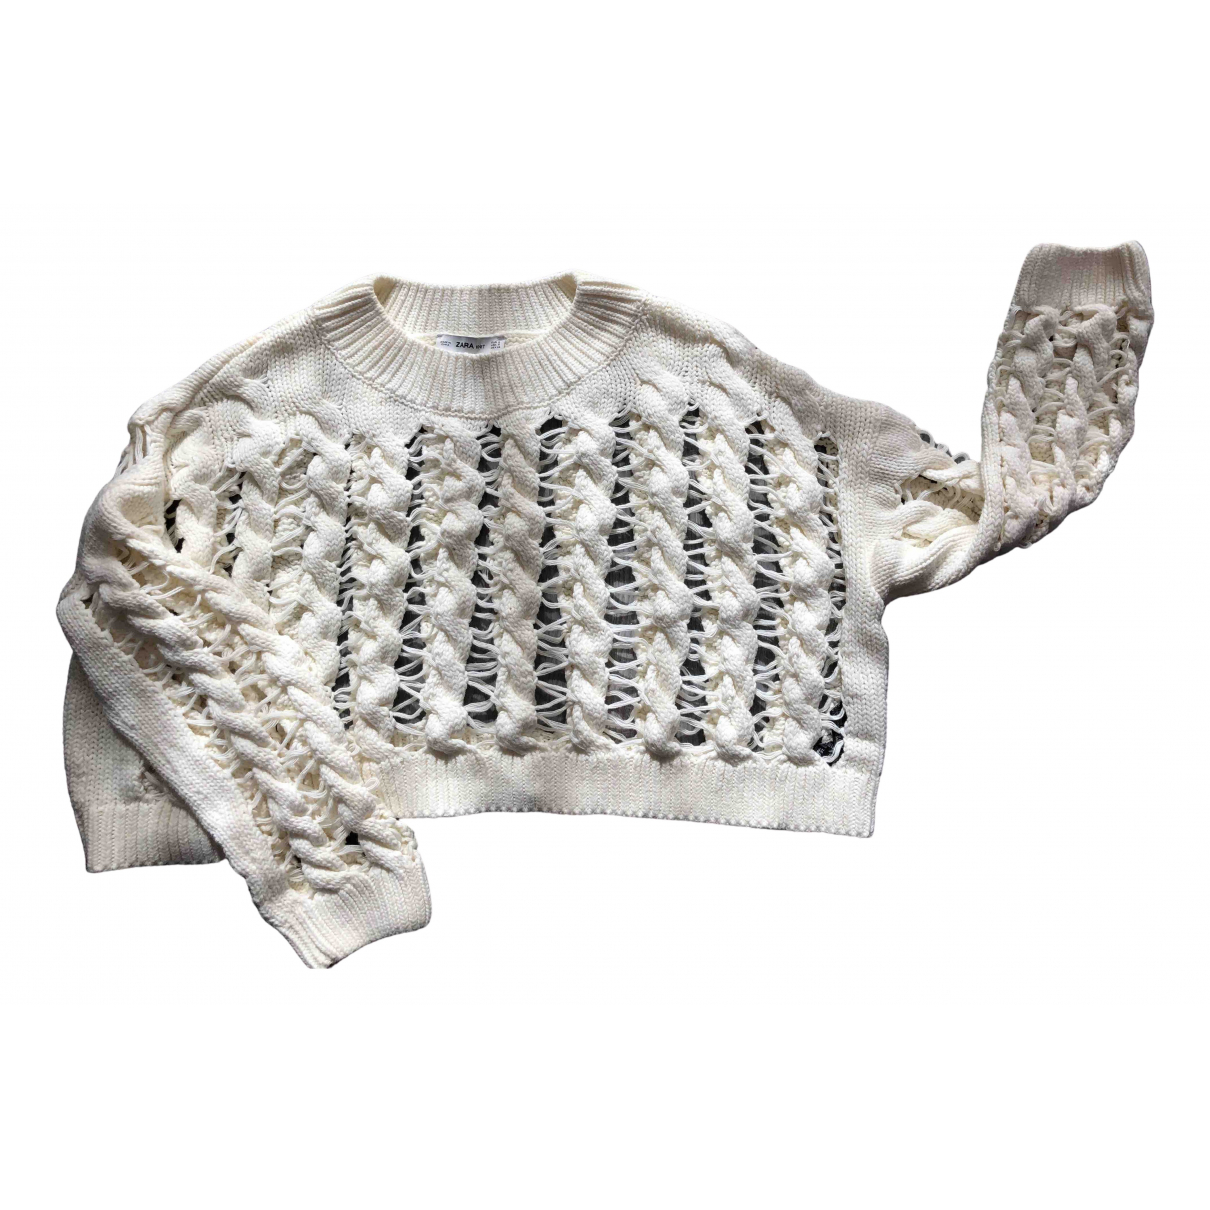 Zara N White Cotton Knitwear for Women S International